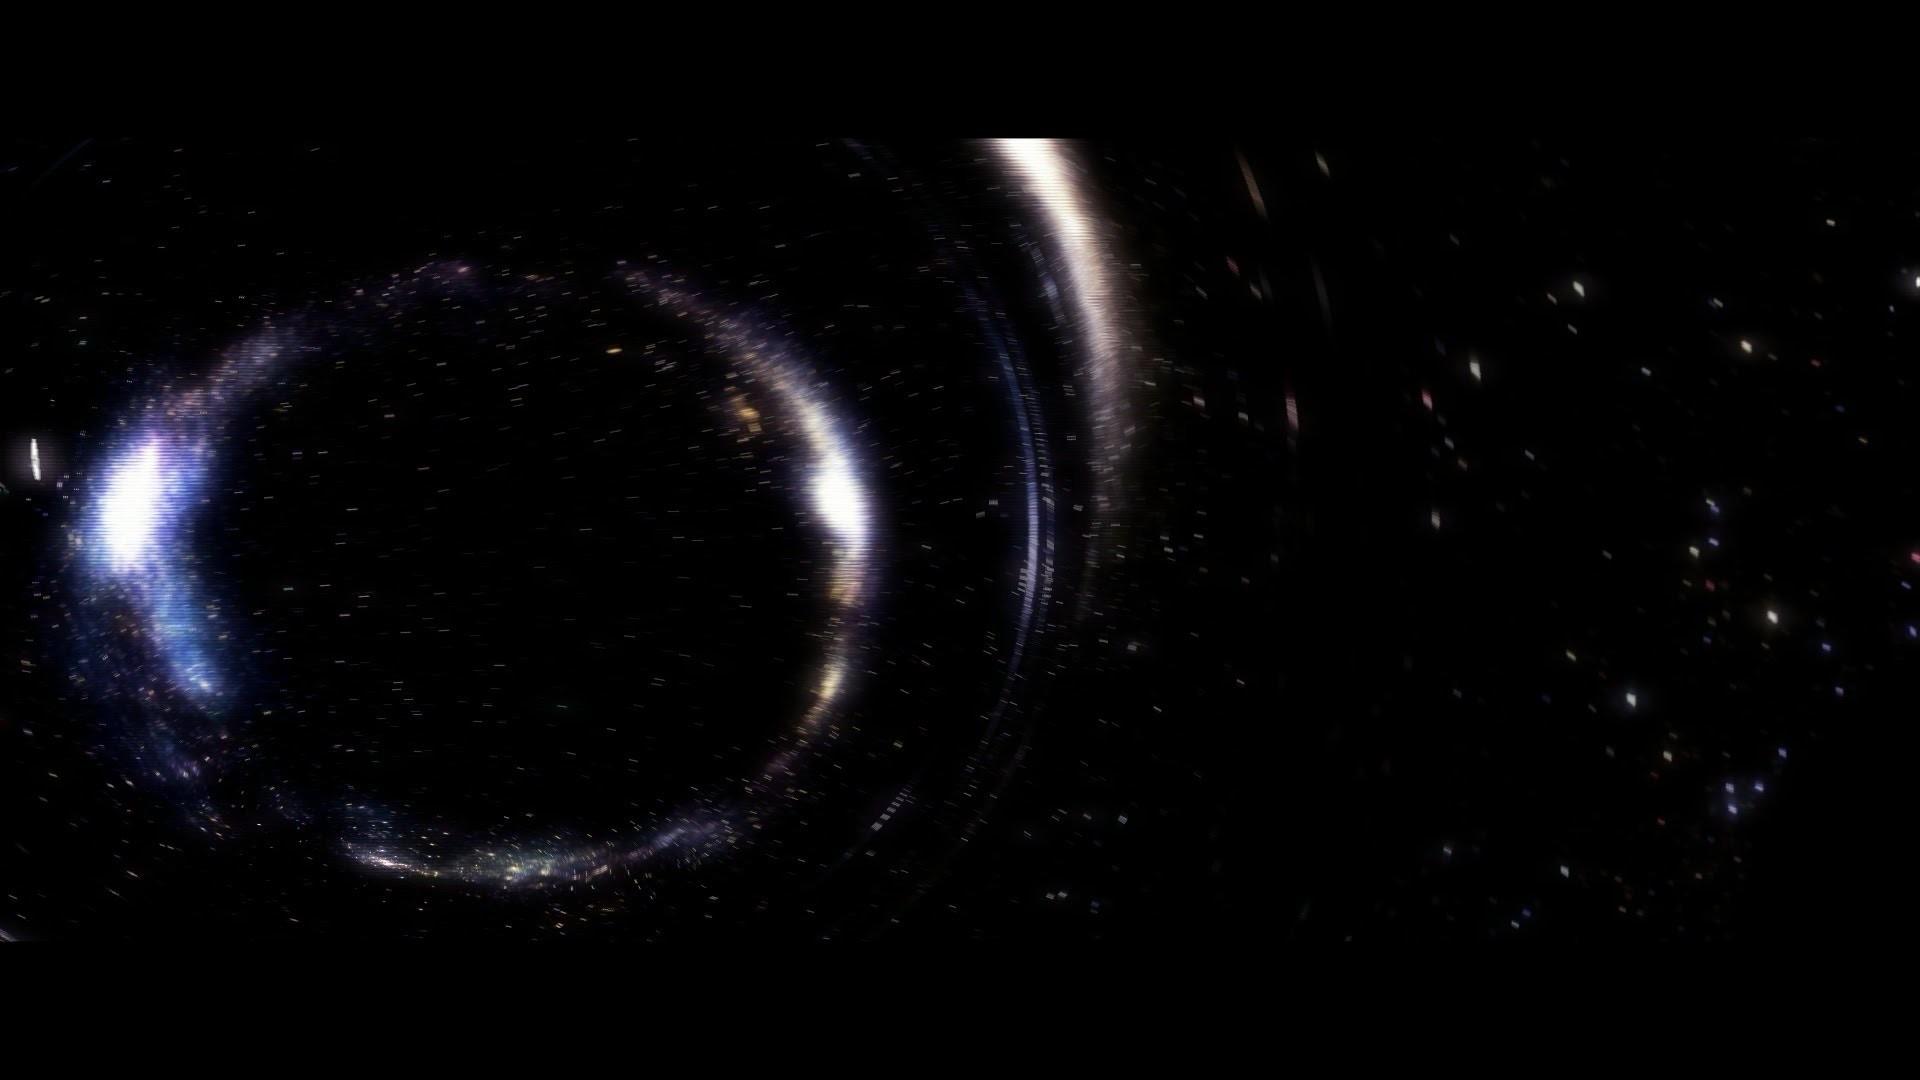 Interstellar Wormhole Wallpaper 70 Images